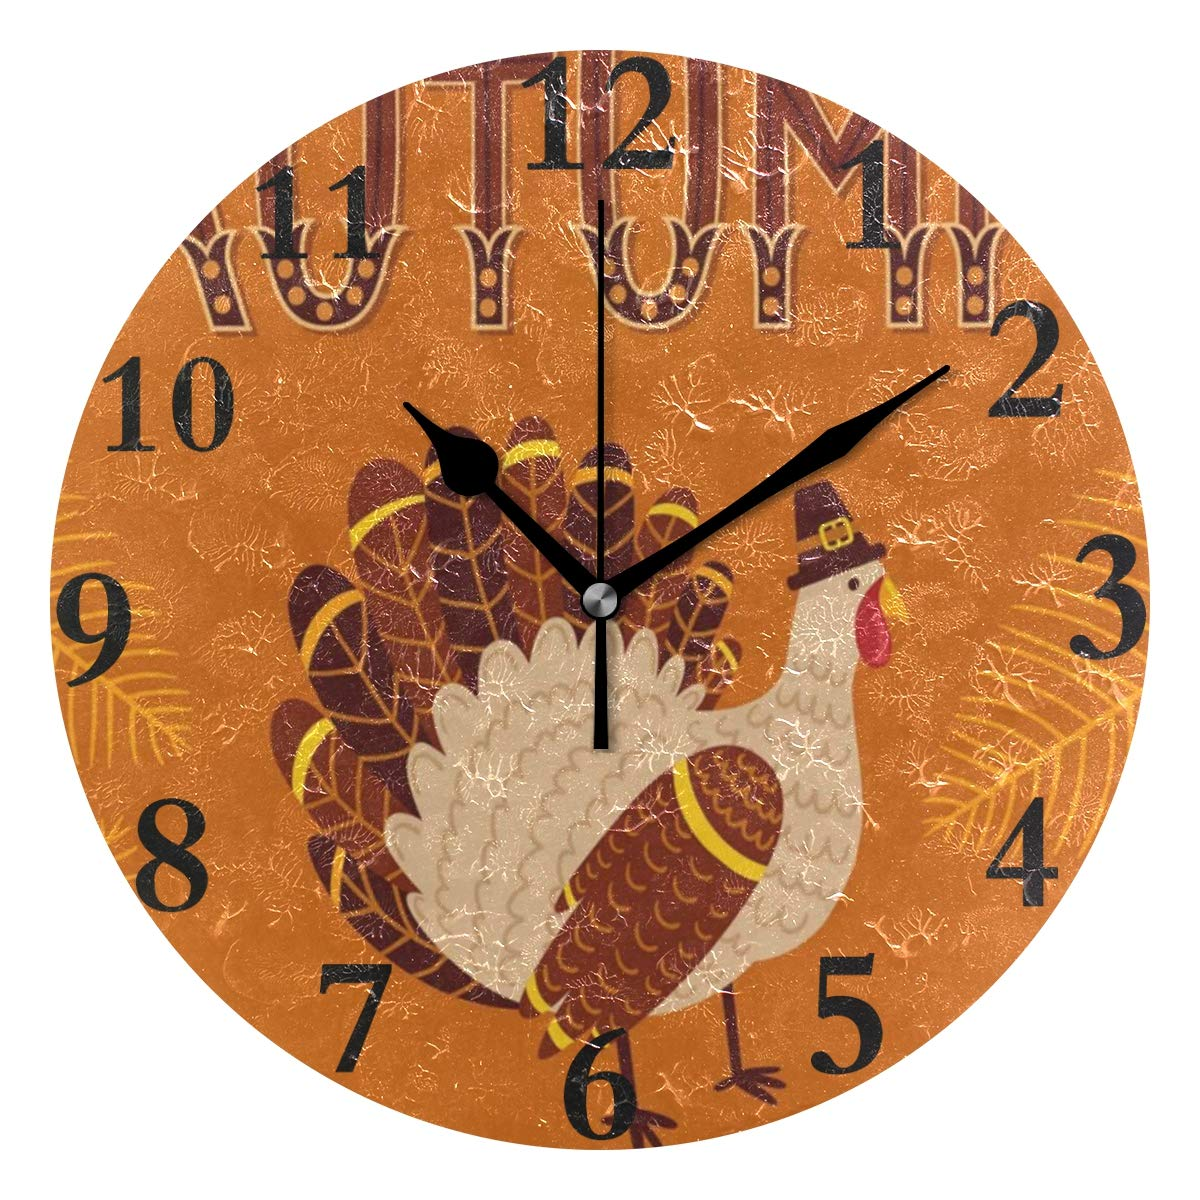 Ladninag Wall Clock Vintage Autumn Turkey Silent Non Ticking Decorative Round Digital Clocks Indoor Outdoor Kitchen Bedroom Living Room